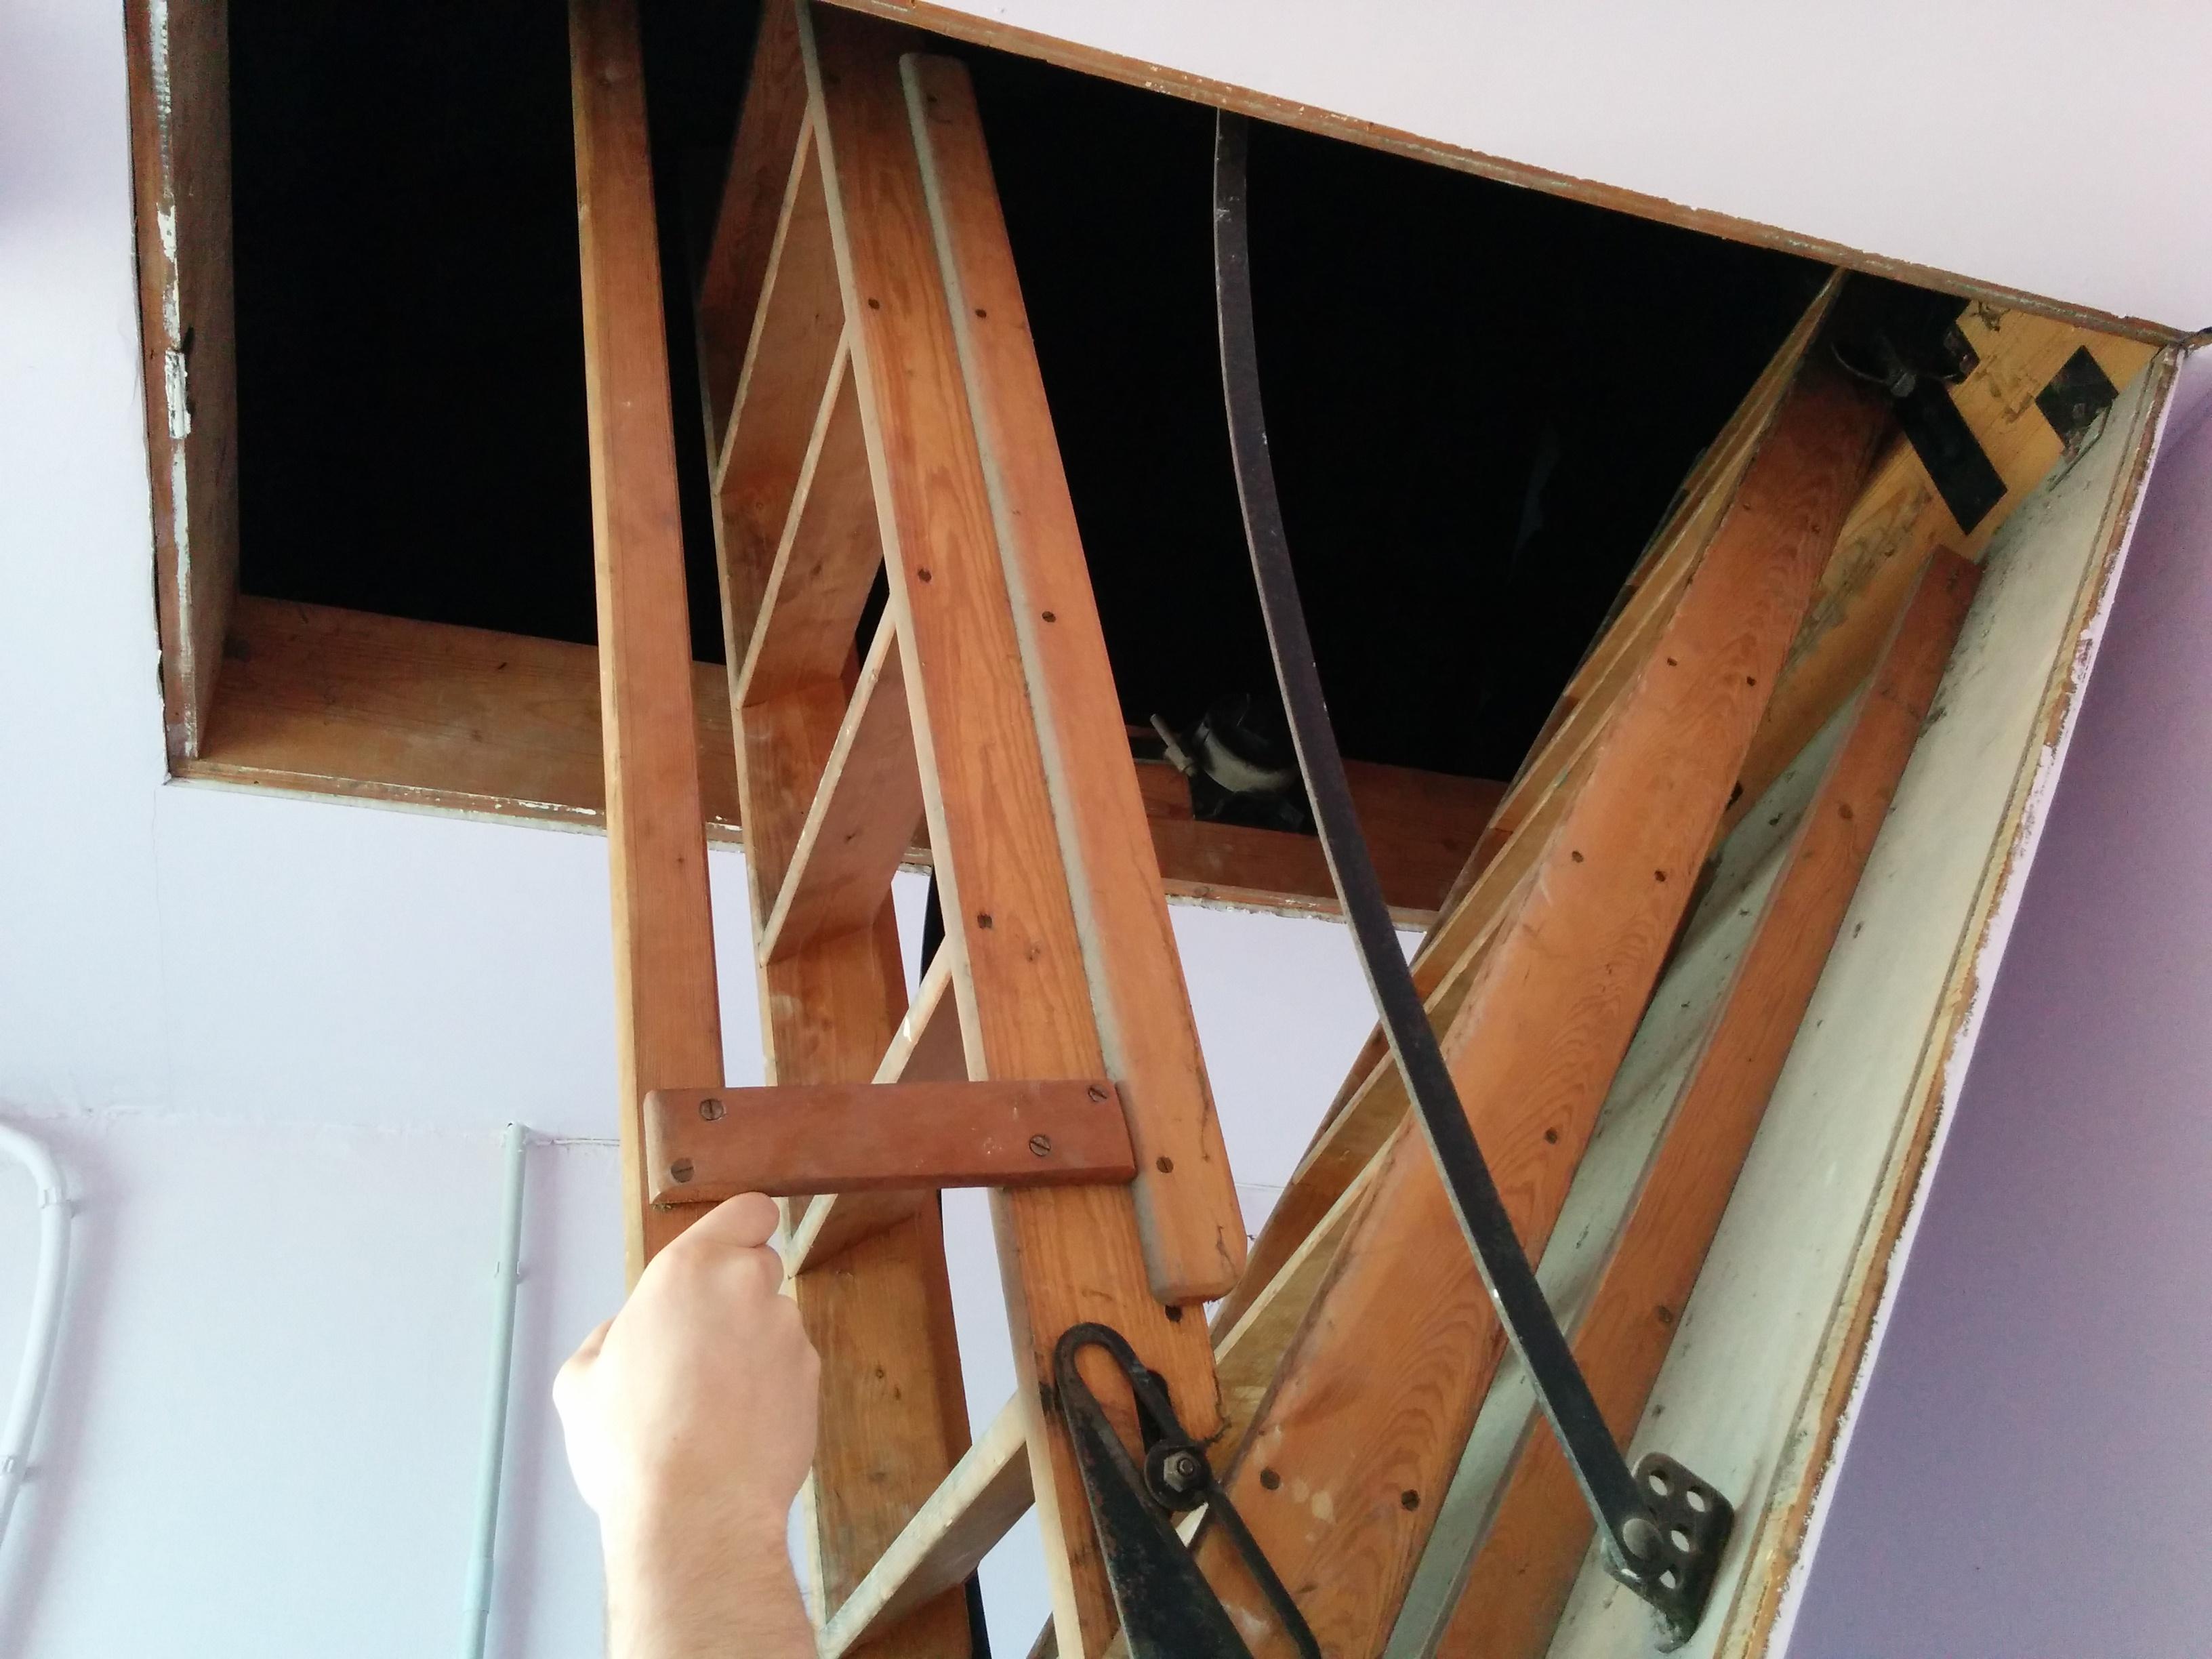 isolation toiture ouate de cellulose ecole namur neltane. Black Bedroom Furniture Sets. Home Design Ideas